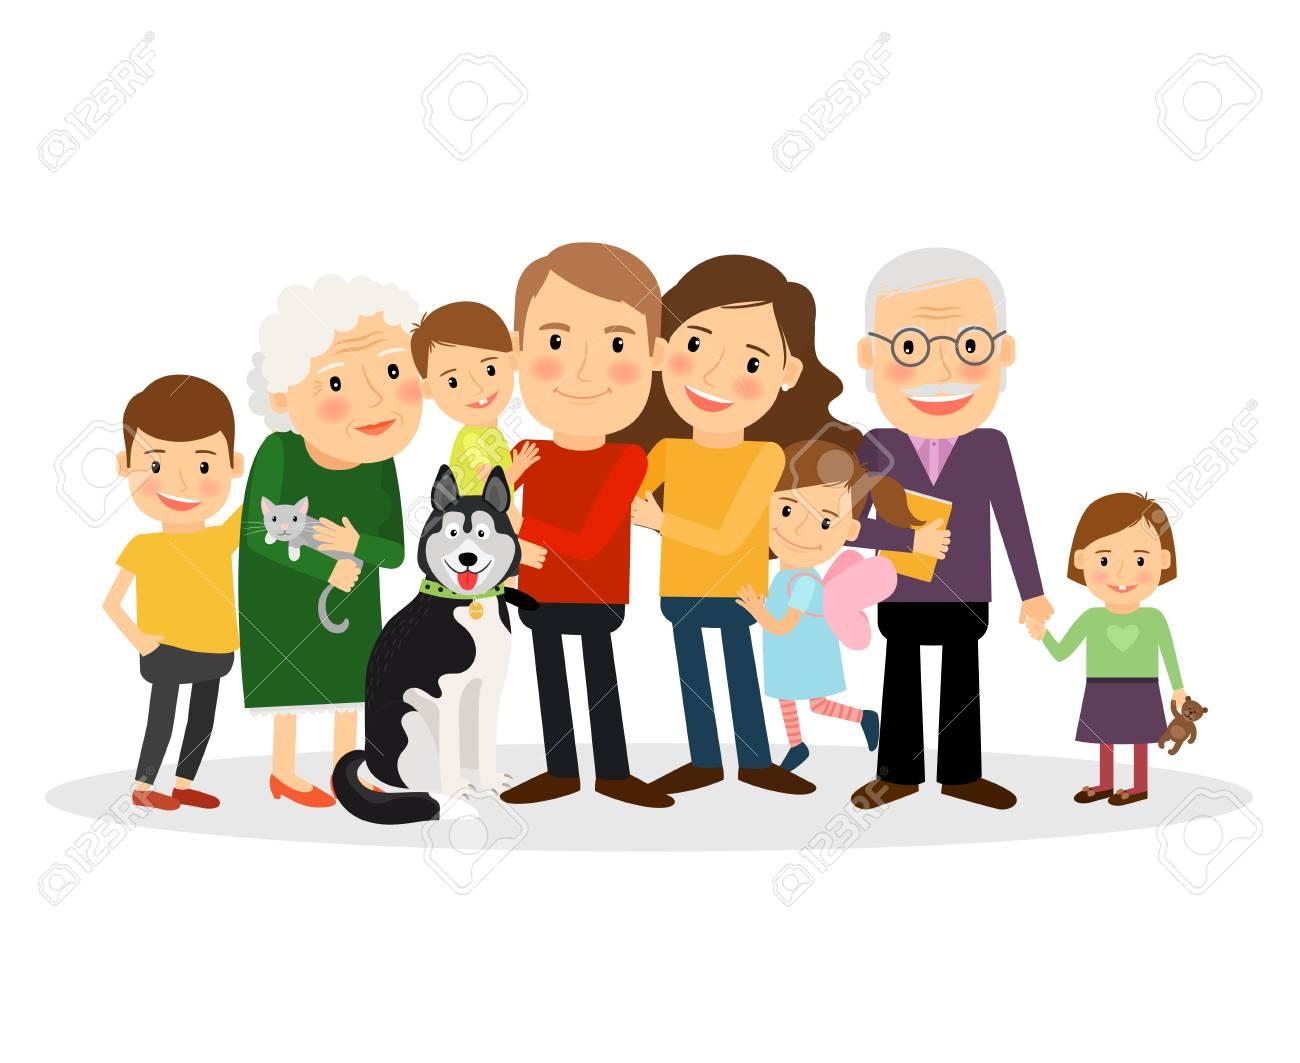 Cartoon family portrait. Big family together. Vector illustration - 55346135